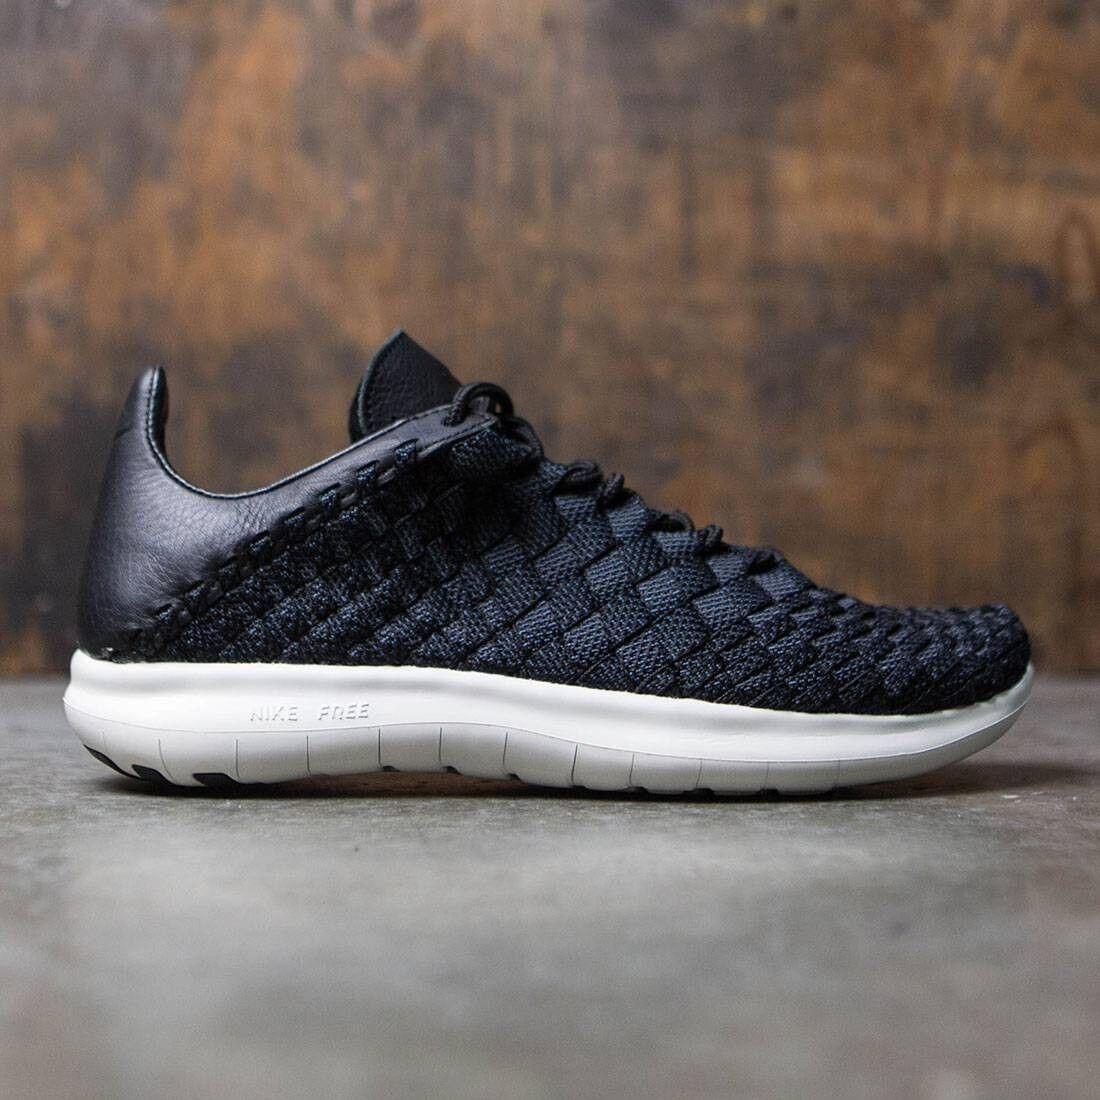 Nike NikeLab Free Inneva Woven Motion Uomo Shoe - Size 12 (BLACK/THUNDER BLUE)